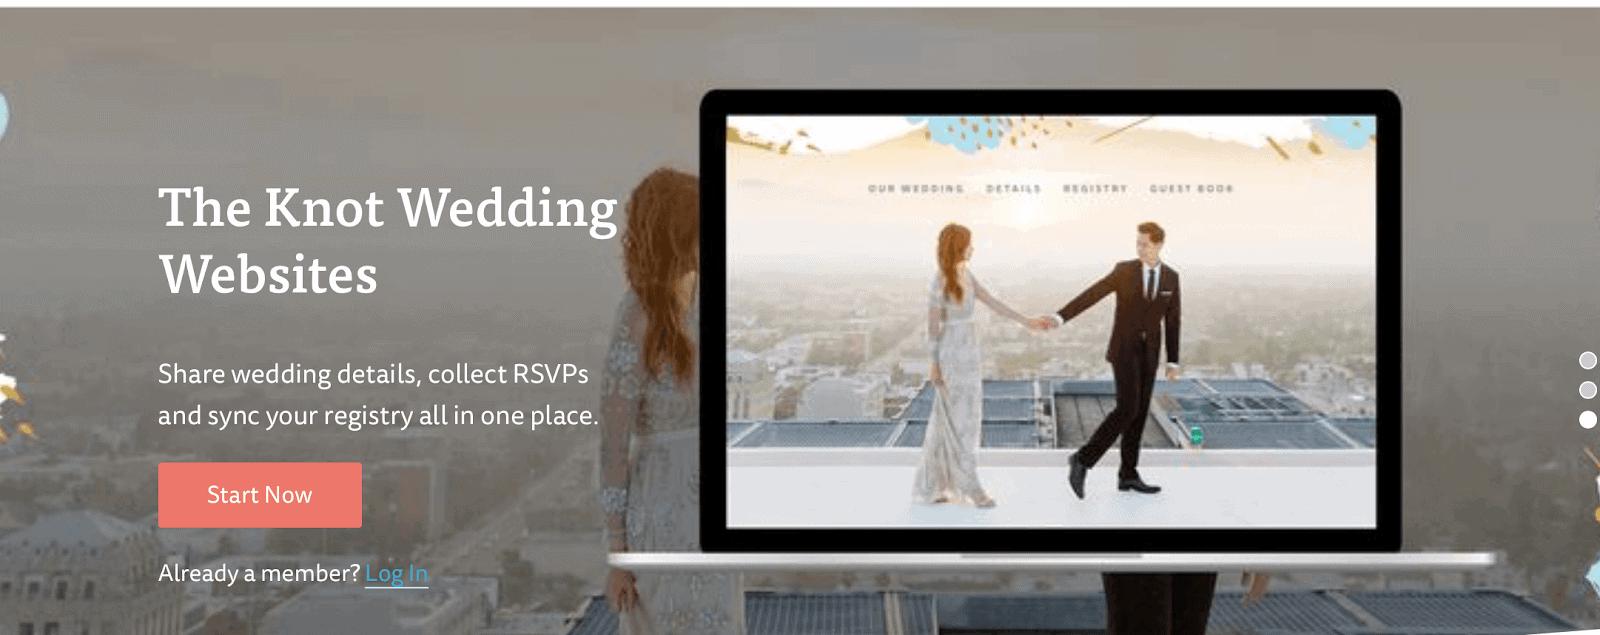 the Knot Wedding Websites